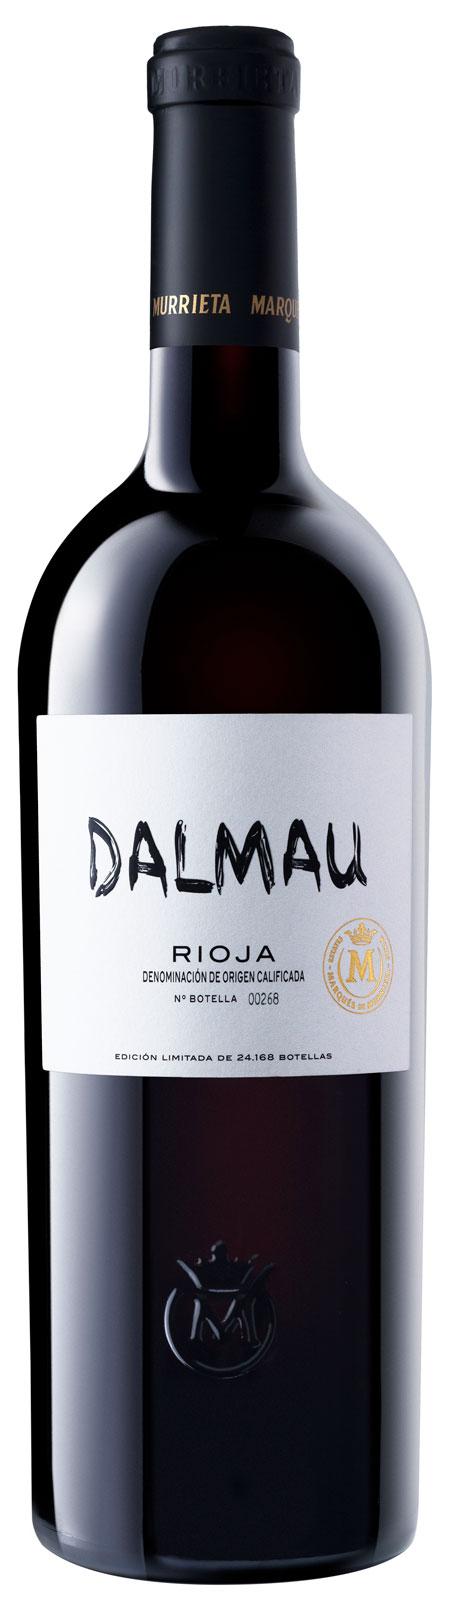 Marqués de Murrieta Dalmau Tinto Reserva Rioja - 1.5 liter